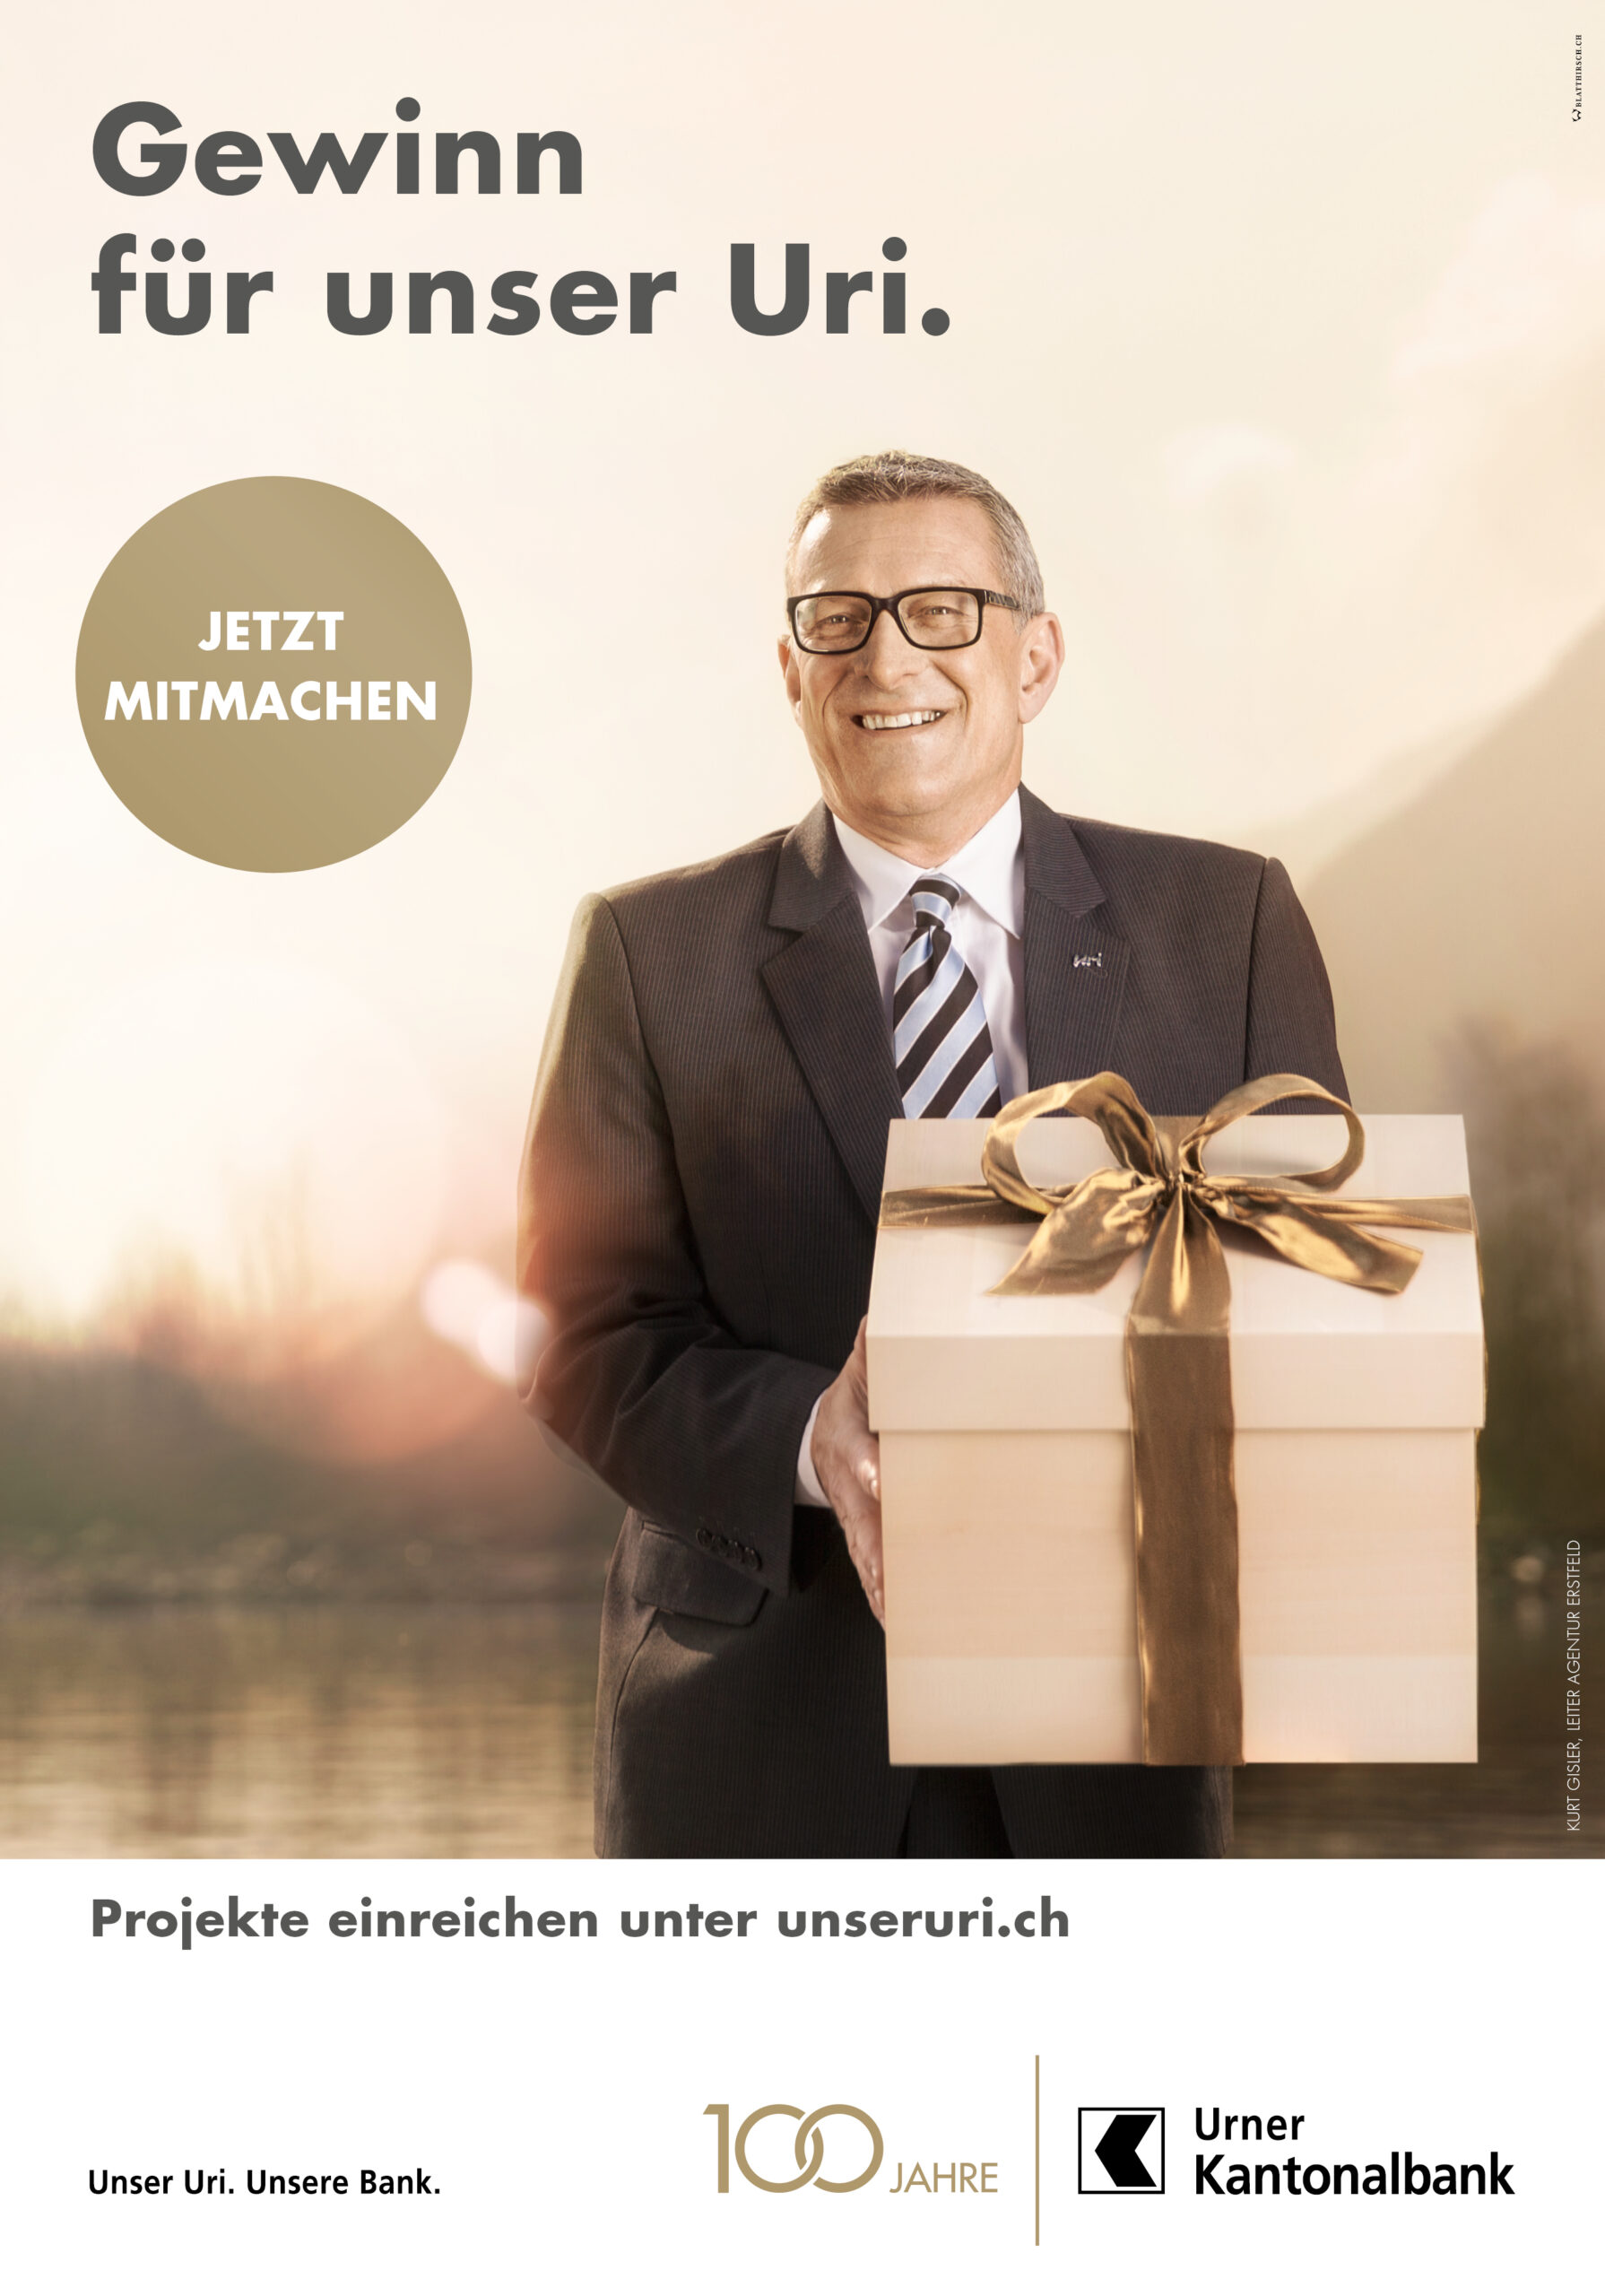 Meier & Kamer Fotografie Werbekampagne zum 100 Jahr Jubiläum der Urner Kantonalbank UKB, F4 Plakat